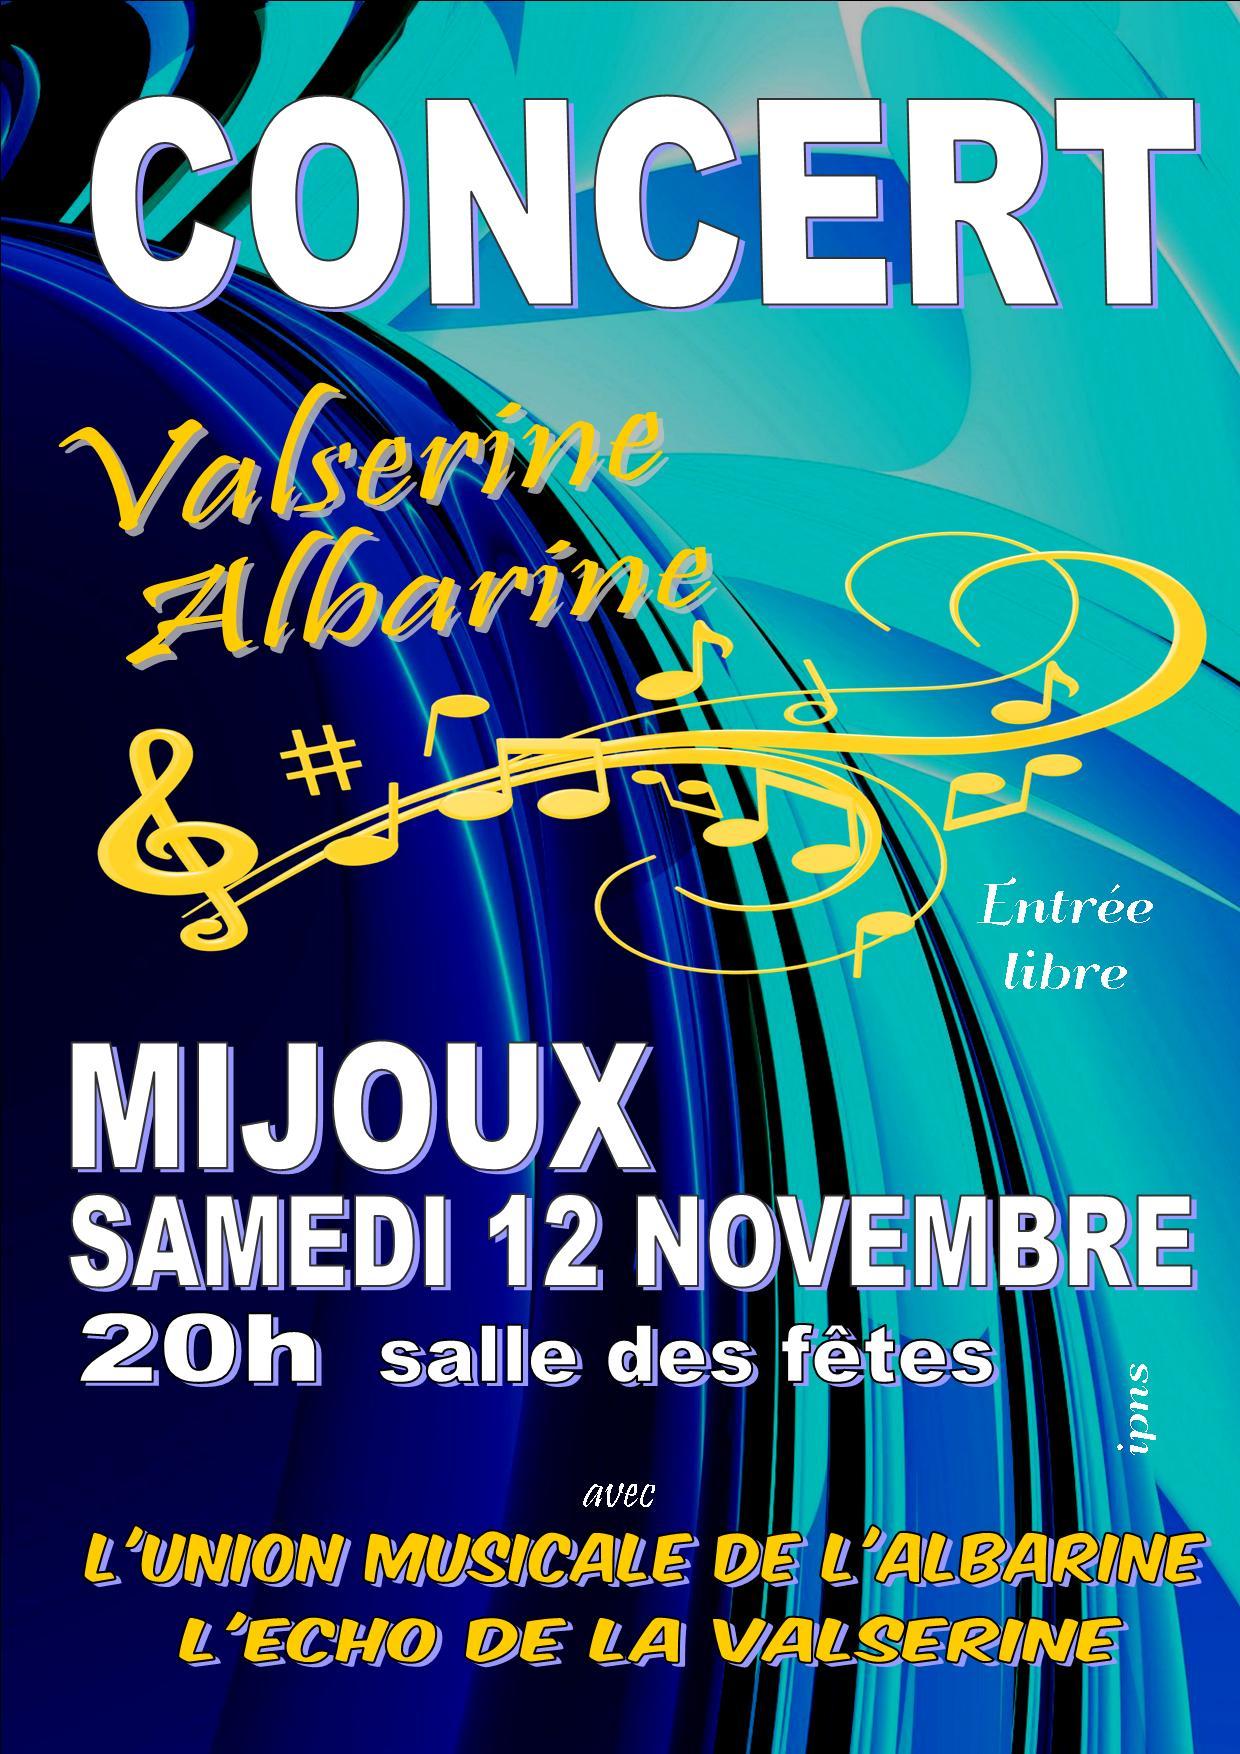 Concert Union Musicale Albarine Echo de la Valserine Mijoux 12 novembre 2016